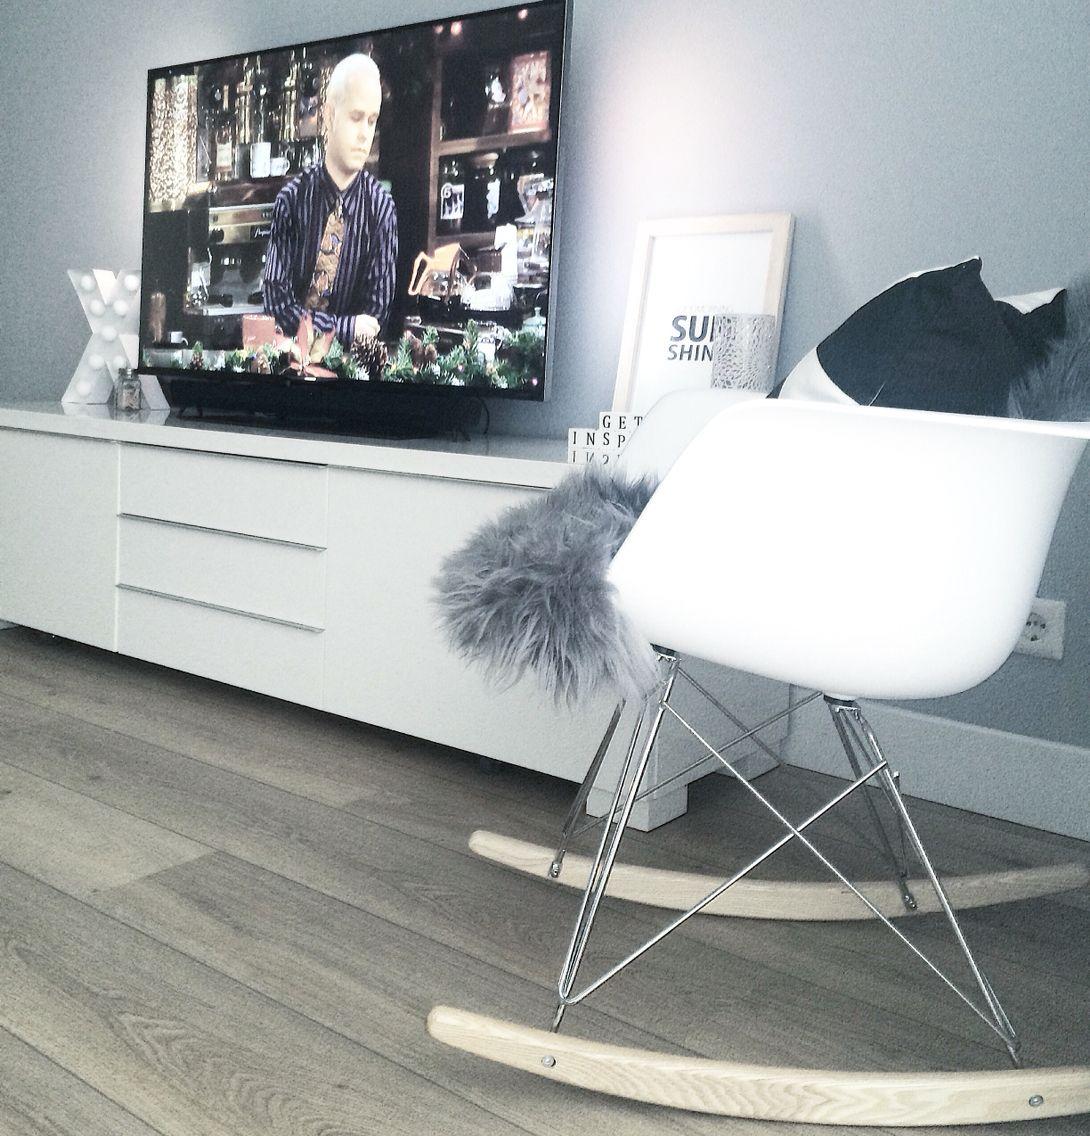 besta burs tv meubel van ikea living room pinterest living rooms room and apartments. Black Bedroom Furniture Sets. Home Design Ideas